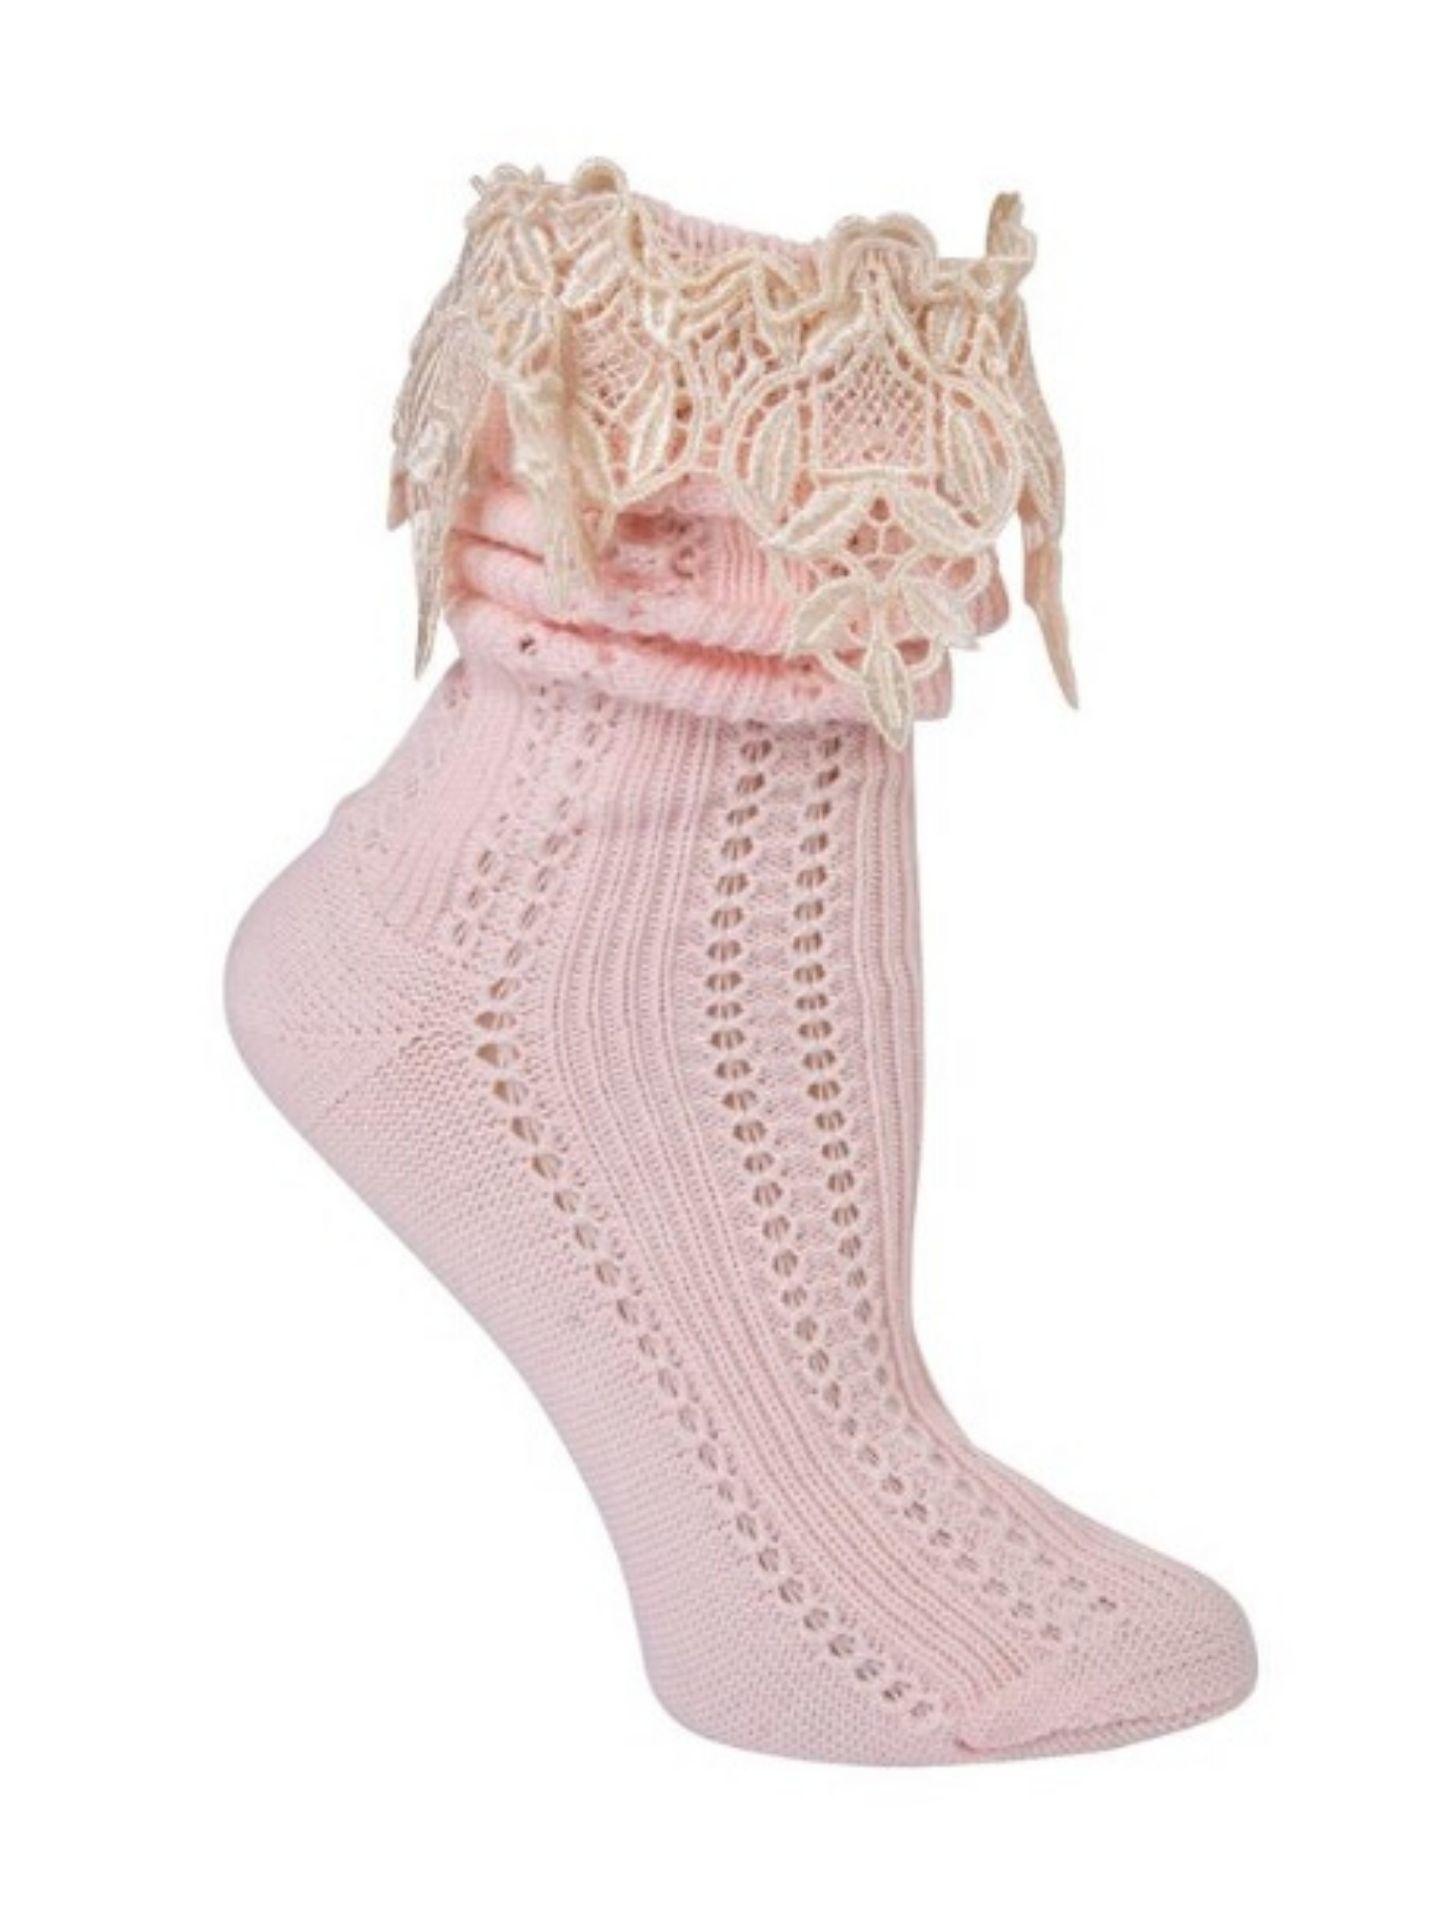 Victorian Trading Co Lavish Lace Socks Pink/Ivory